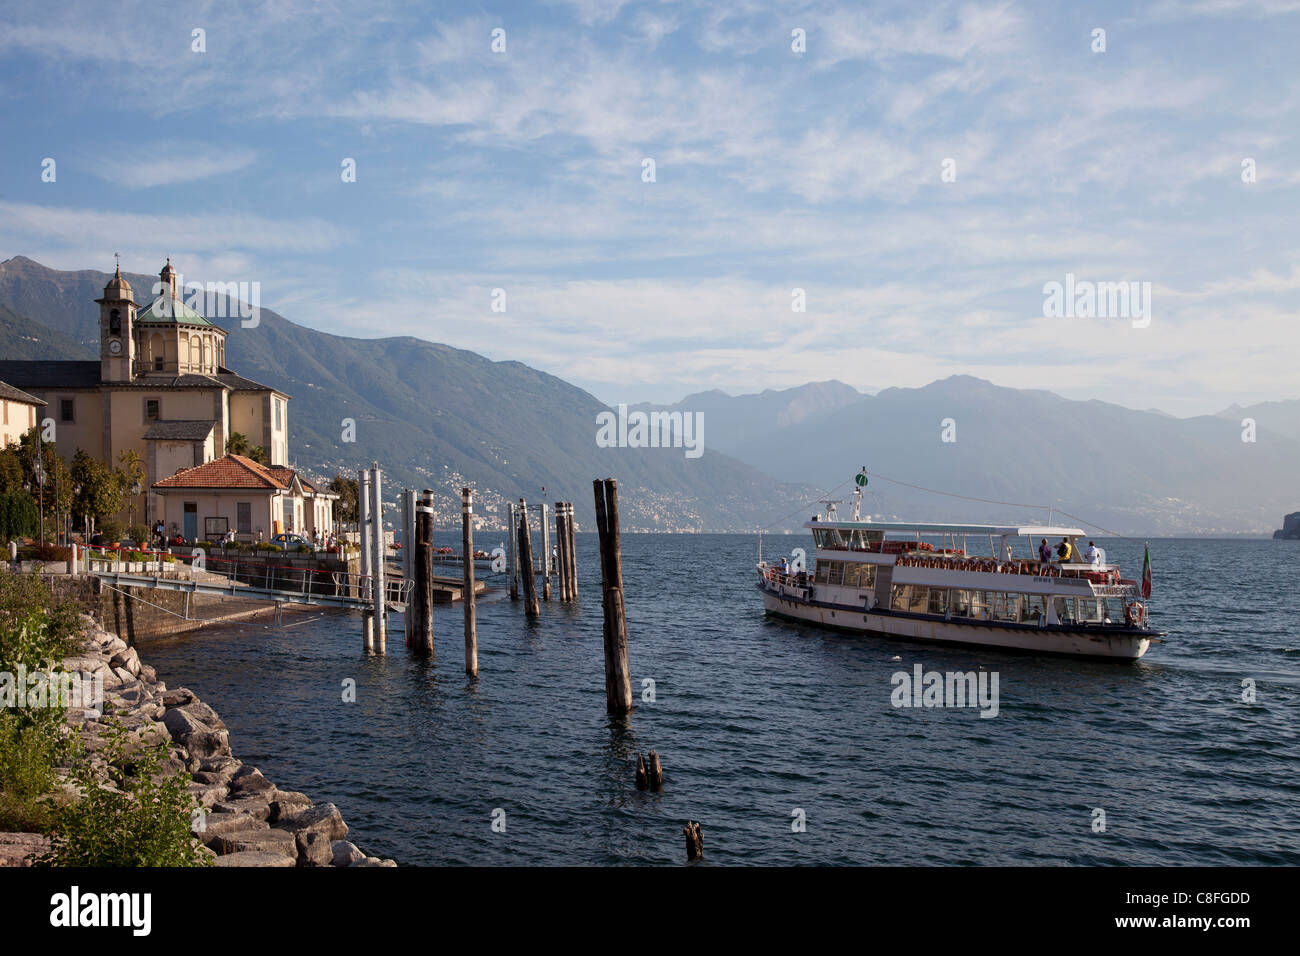 Cannobio, Lake Maggiore, Italian Lakes, Piedmont, Italy - Stock Image